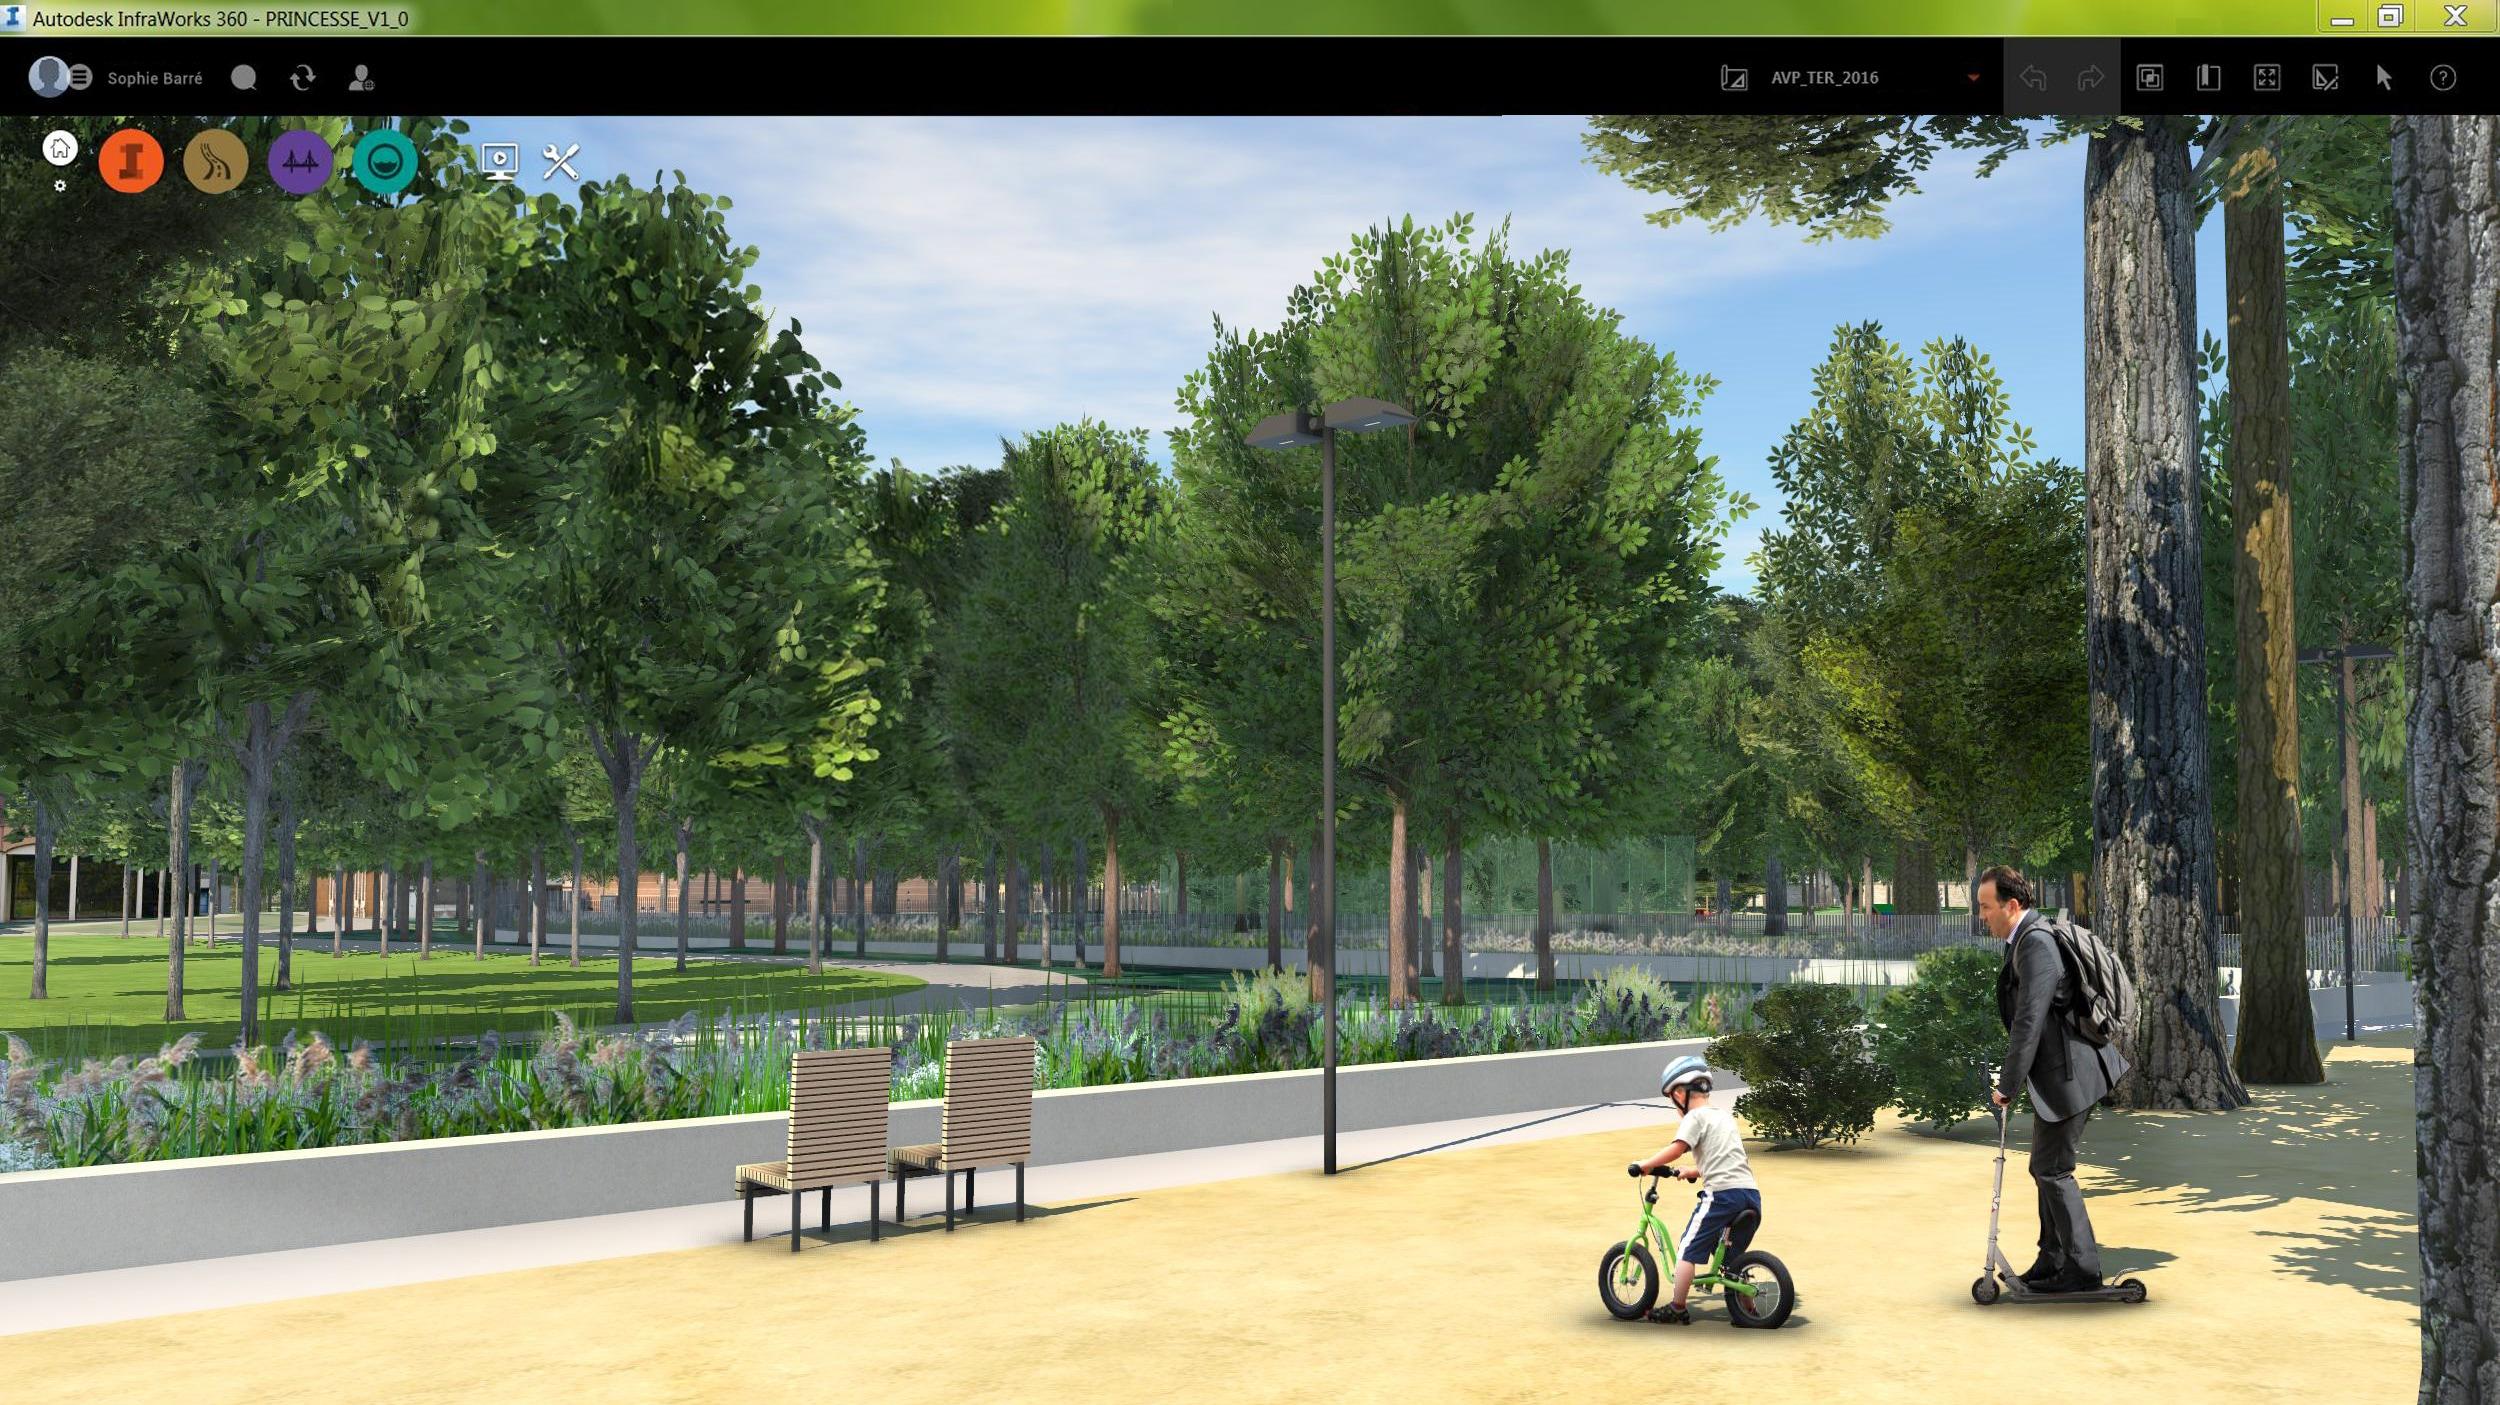 Die Esplanade des Parc Princesse